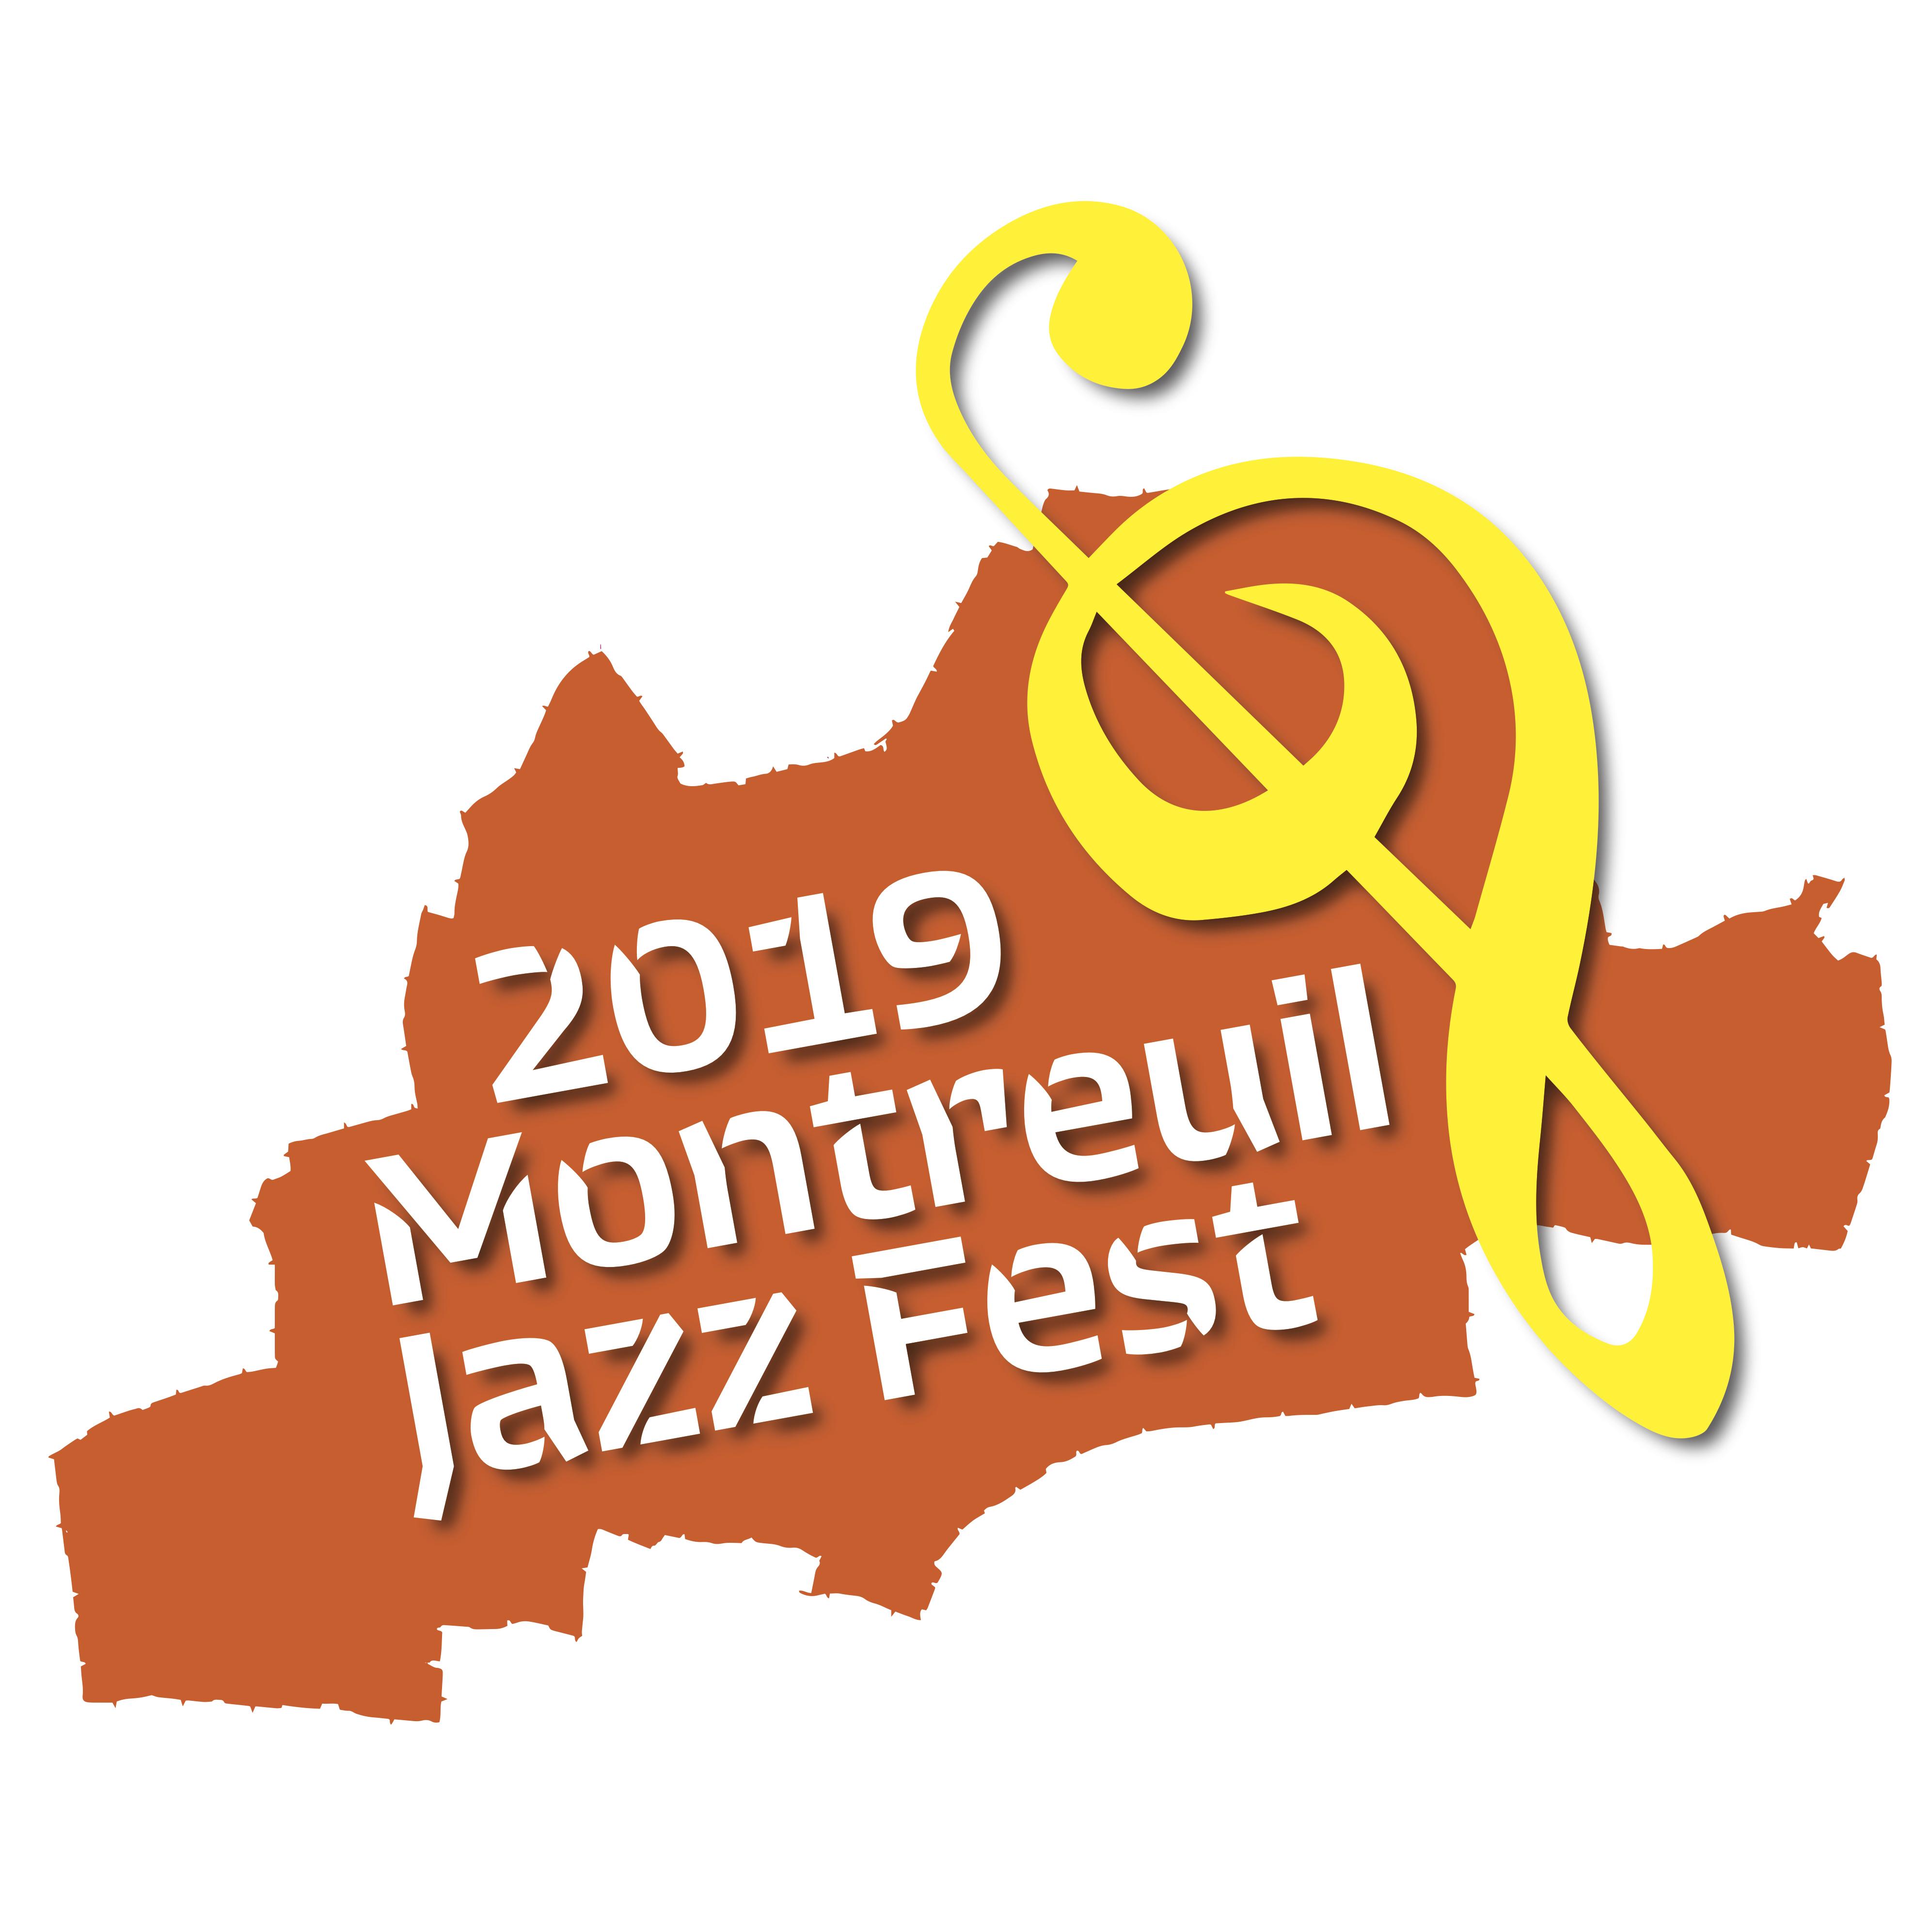 Montreuil Jazz Fest